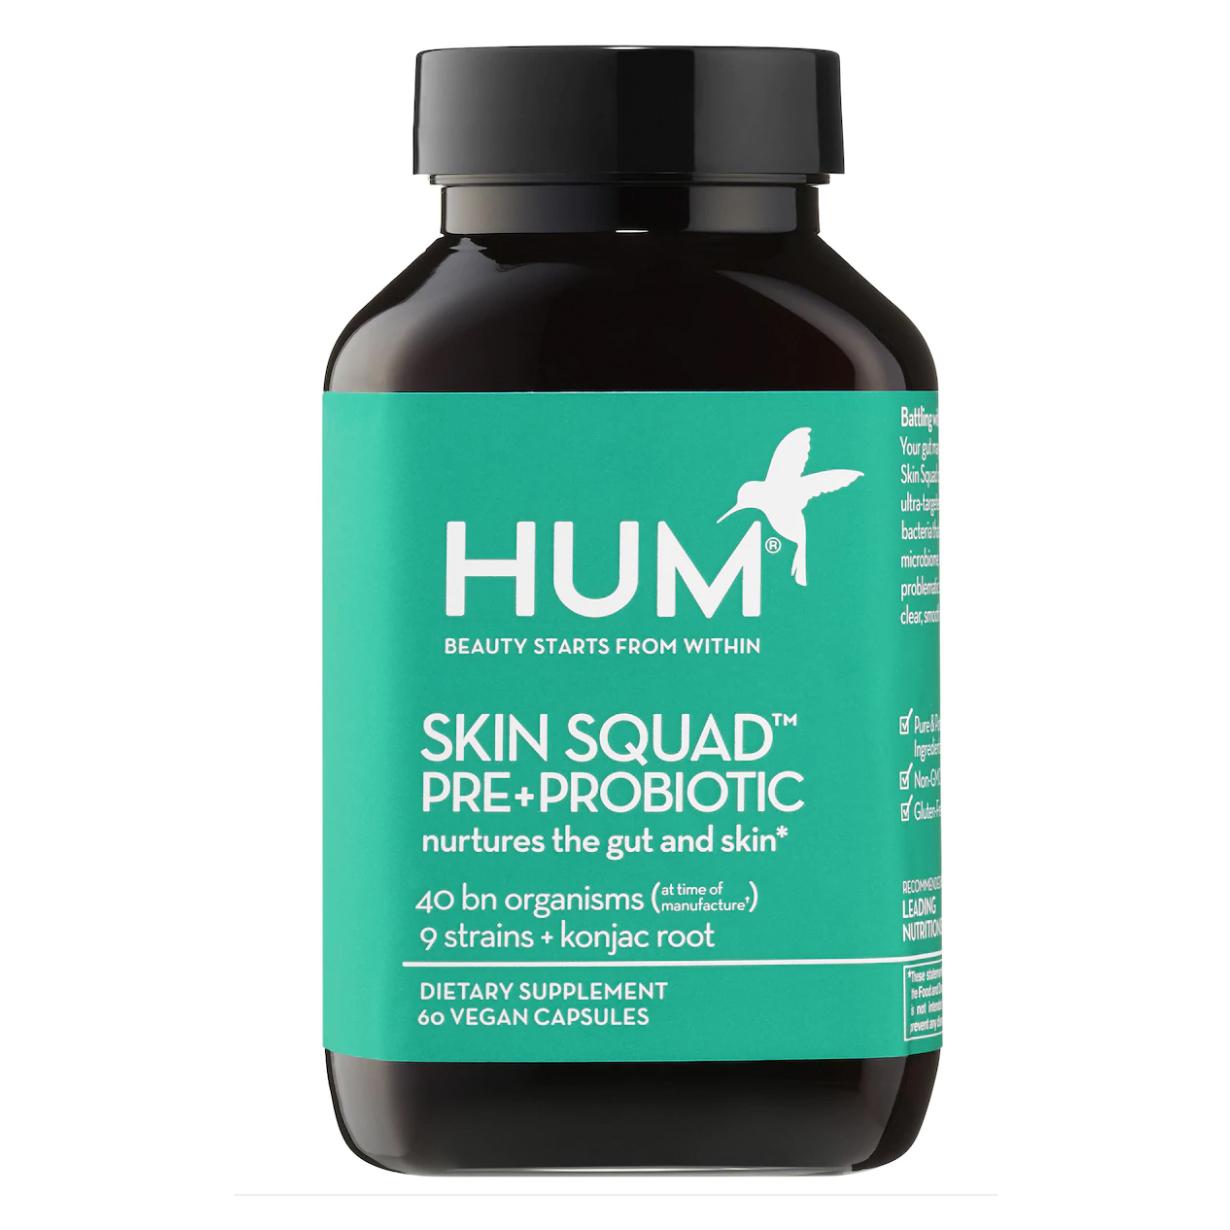 probiotic skincare hum nutrition supplements benefits